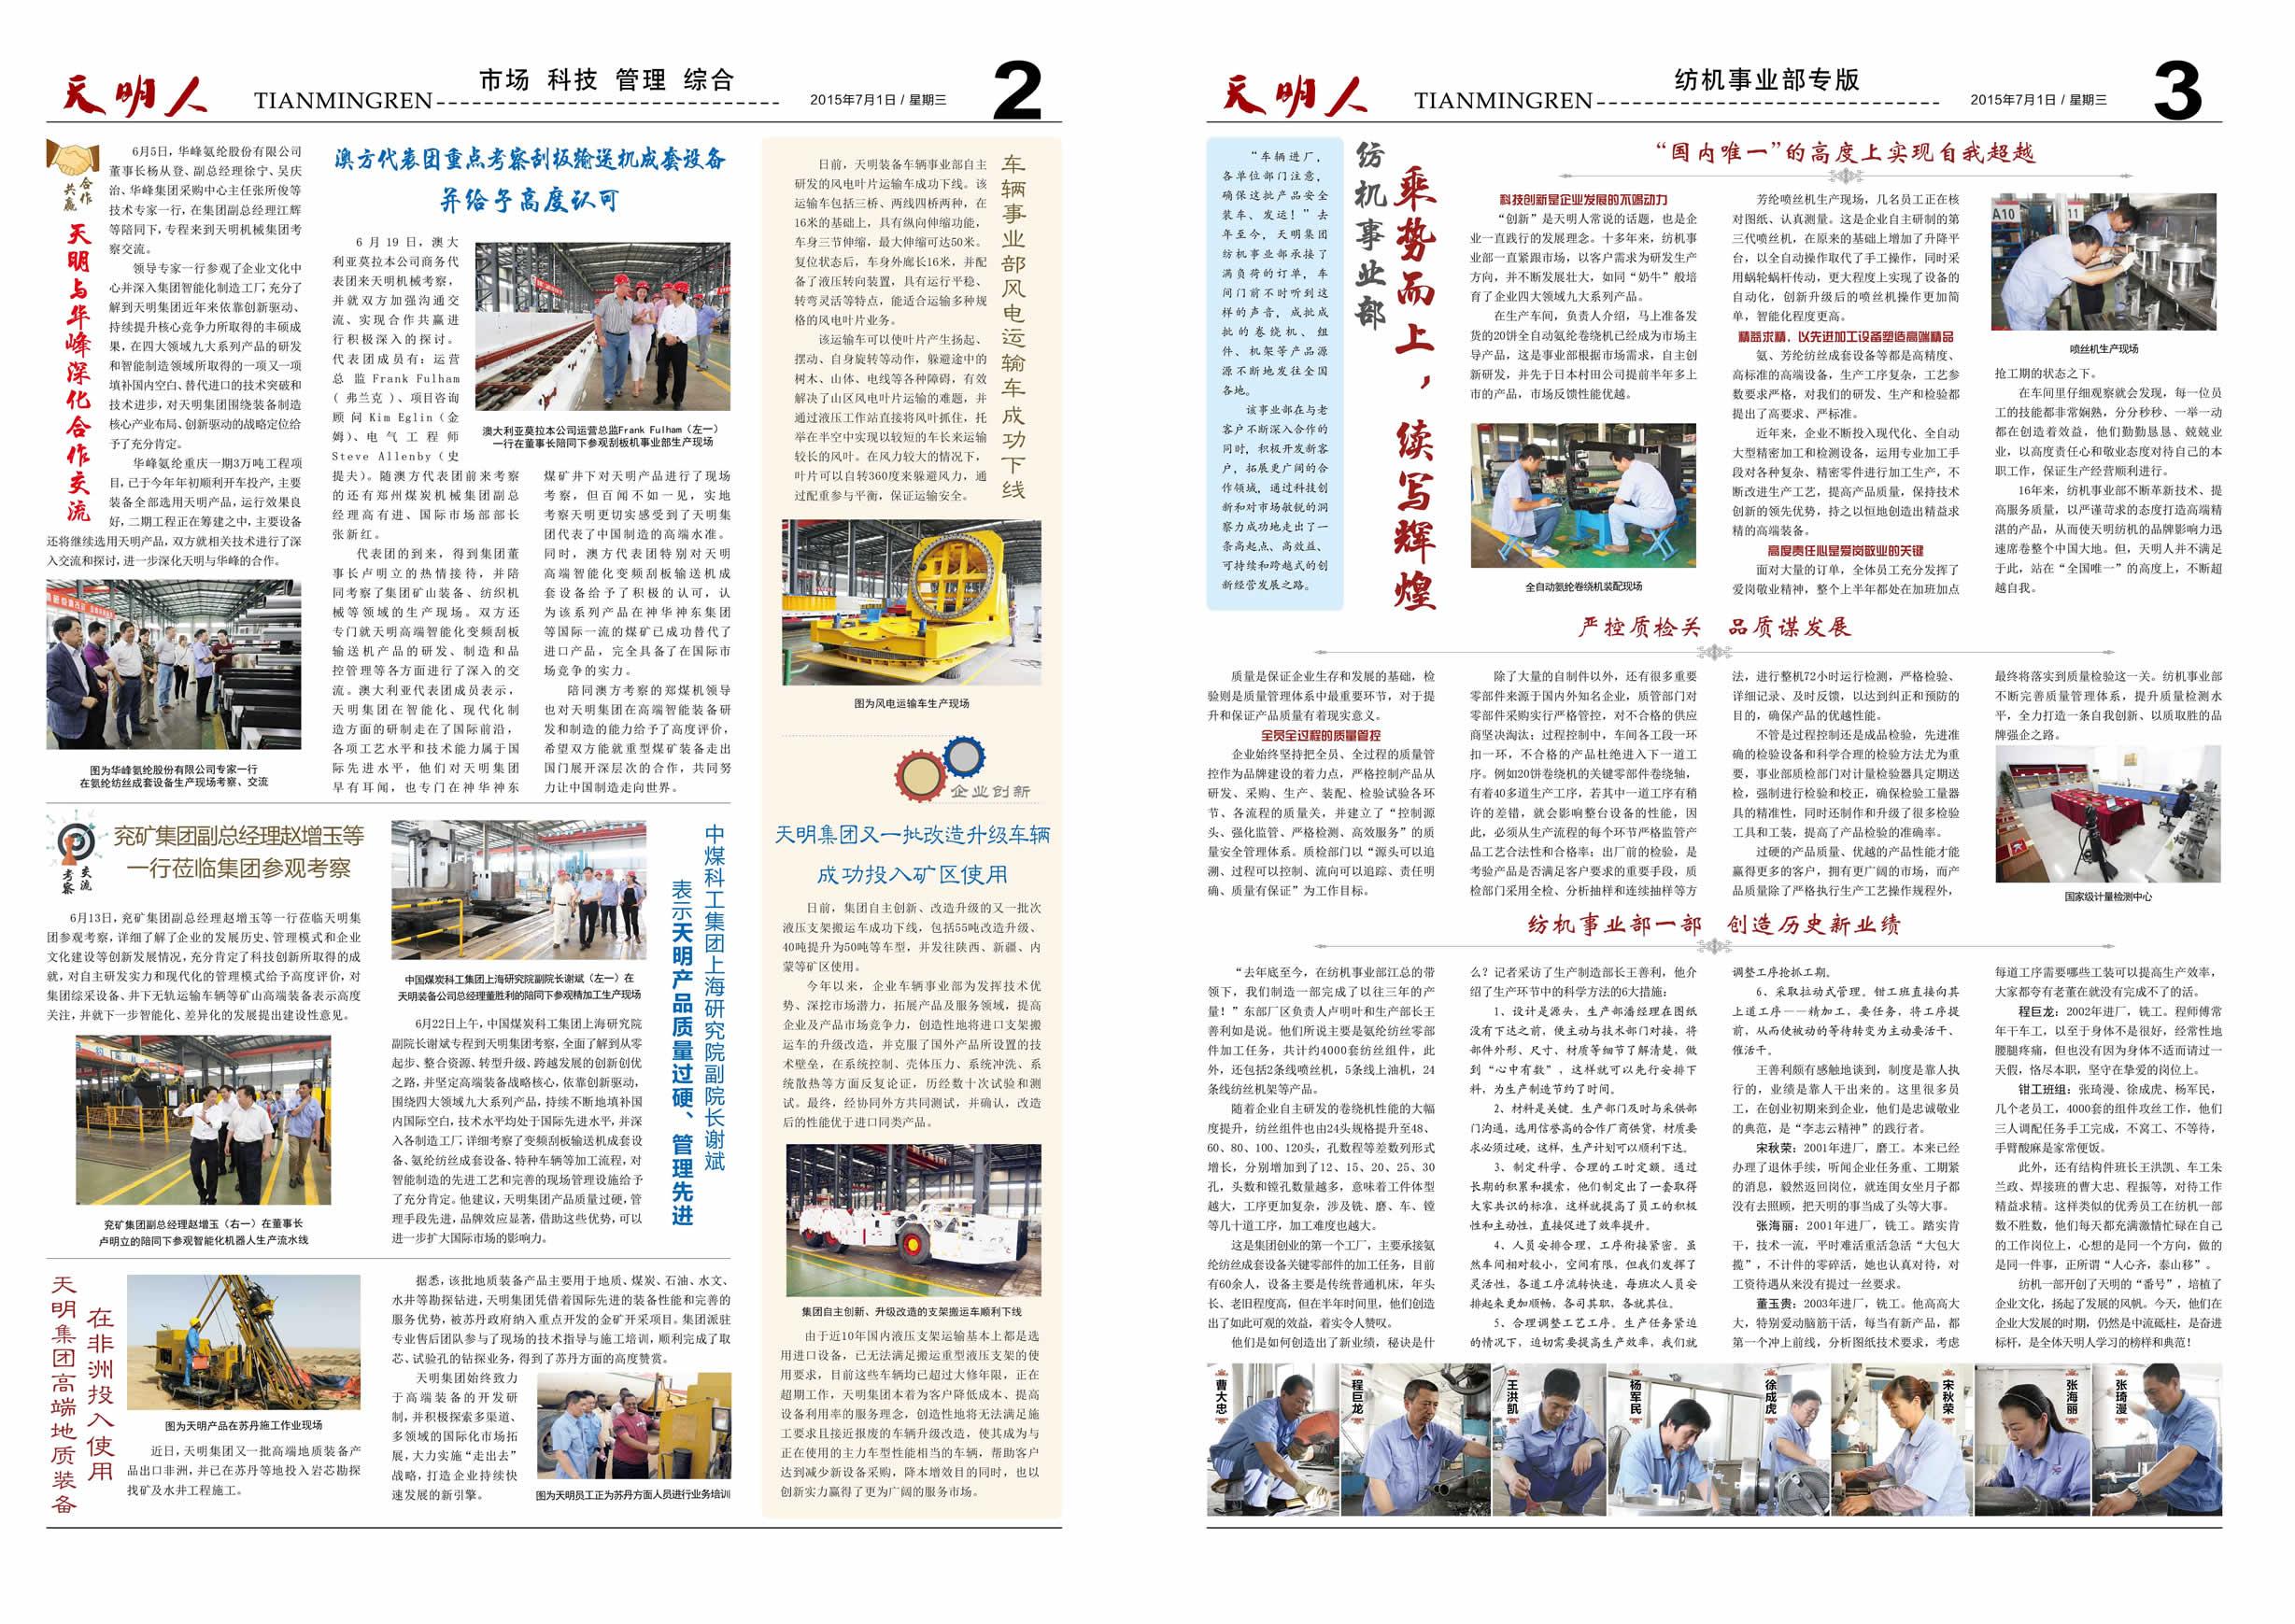 hg711皇冠国际_hg88皇冠国际平台_hg皇冠国际vip首页人2015第07期(总第92期)2、3版